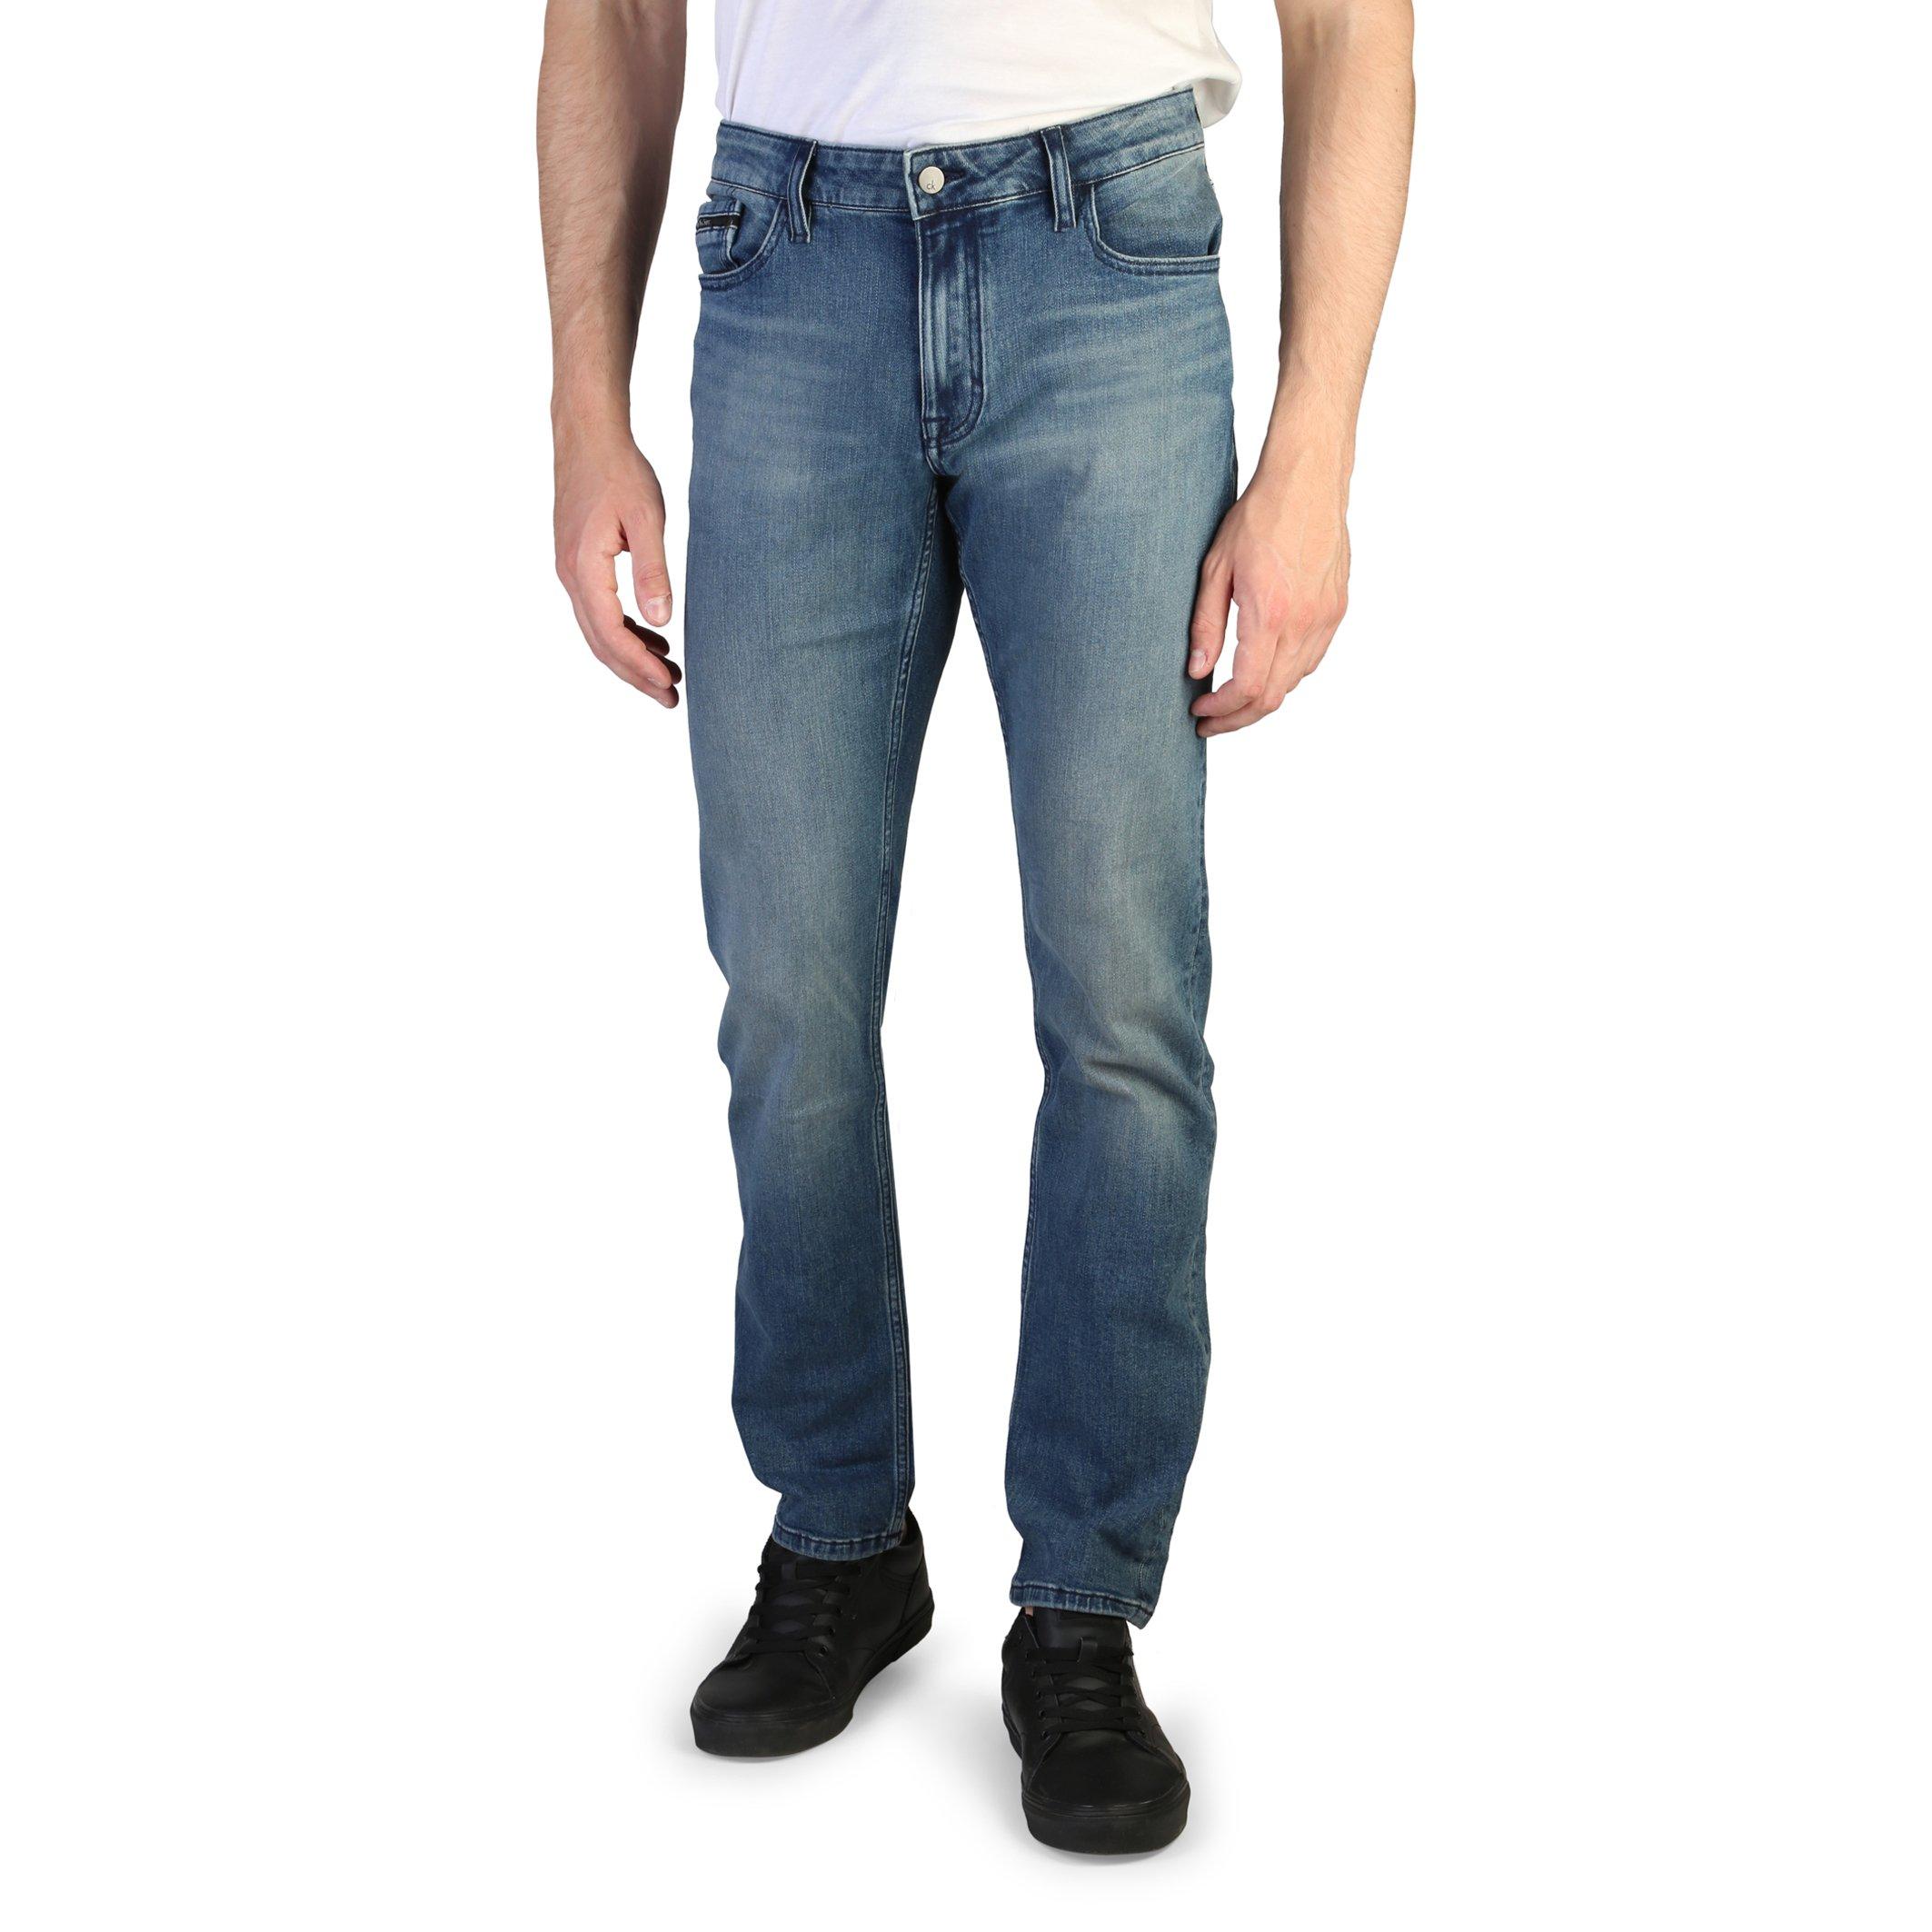 Calvin Klein Men's Jeans Blue J30J306023 - blue-1 28